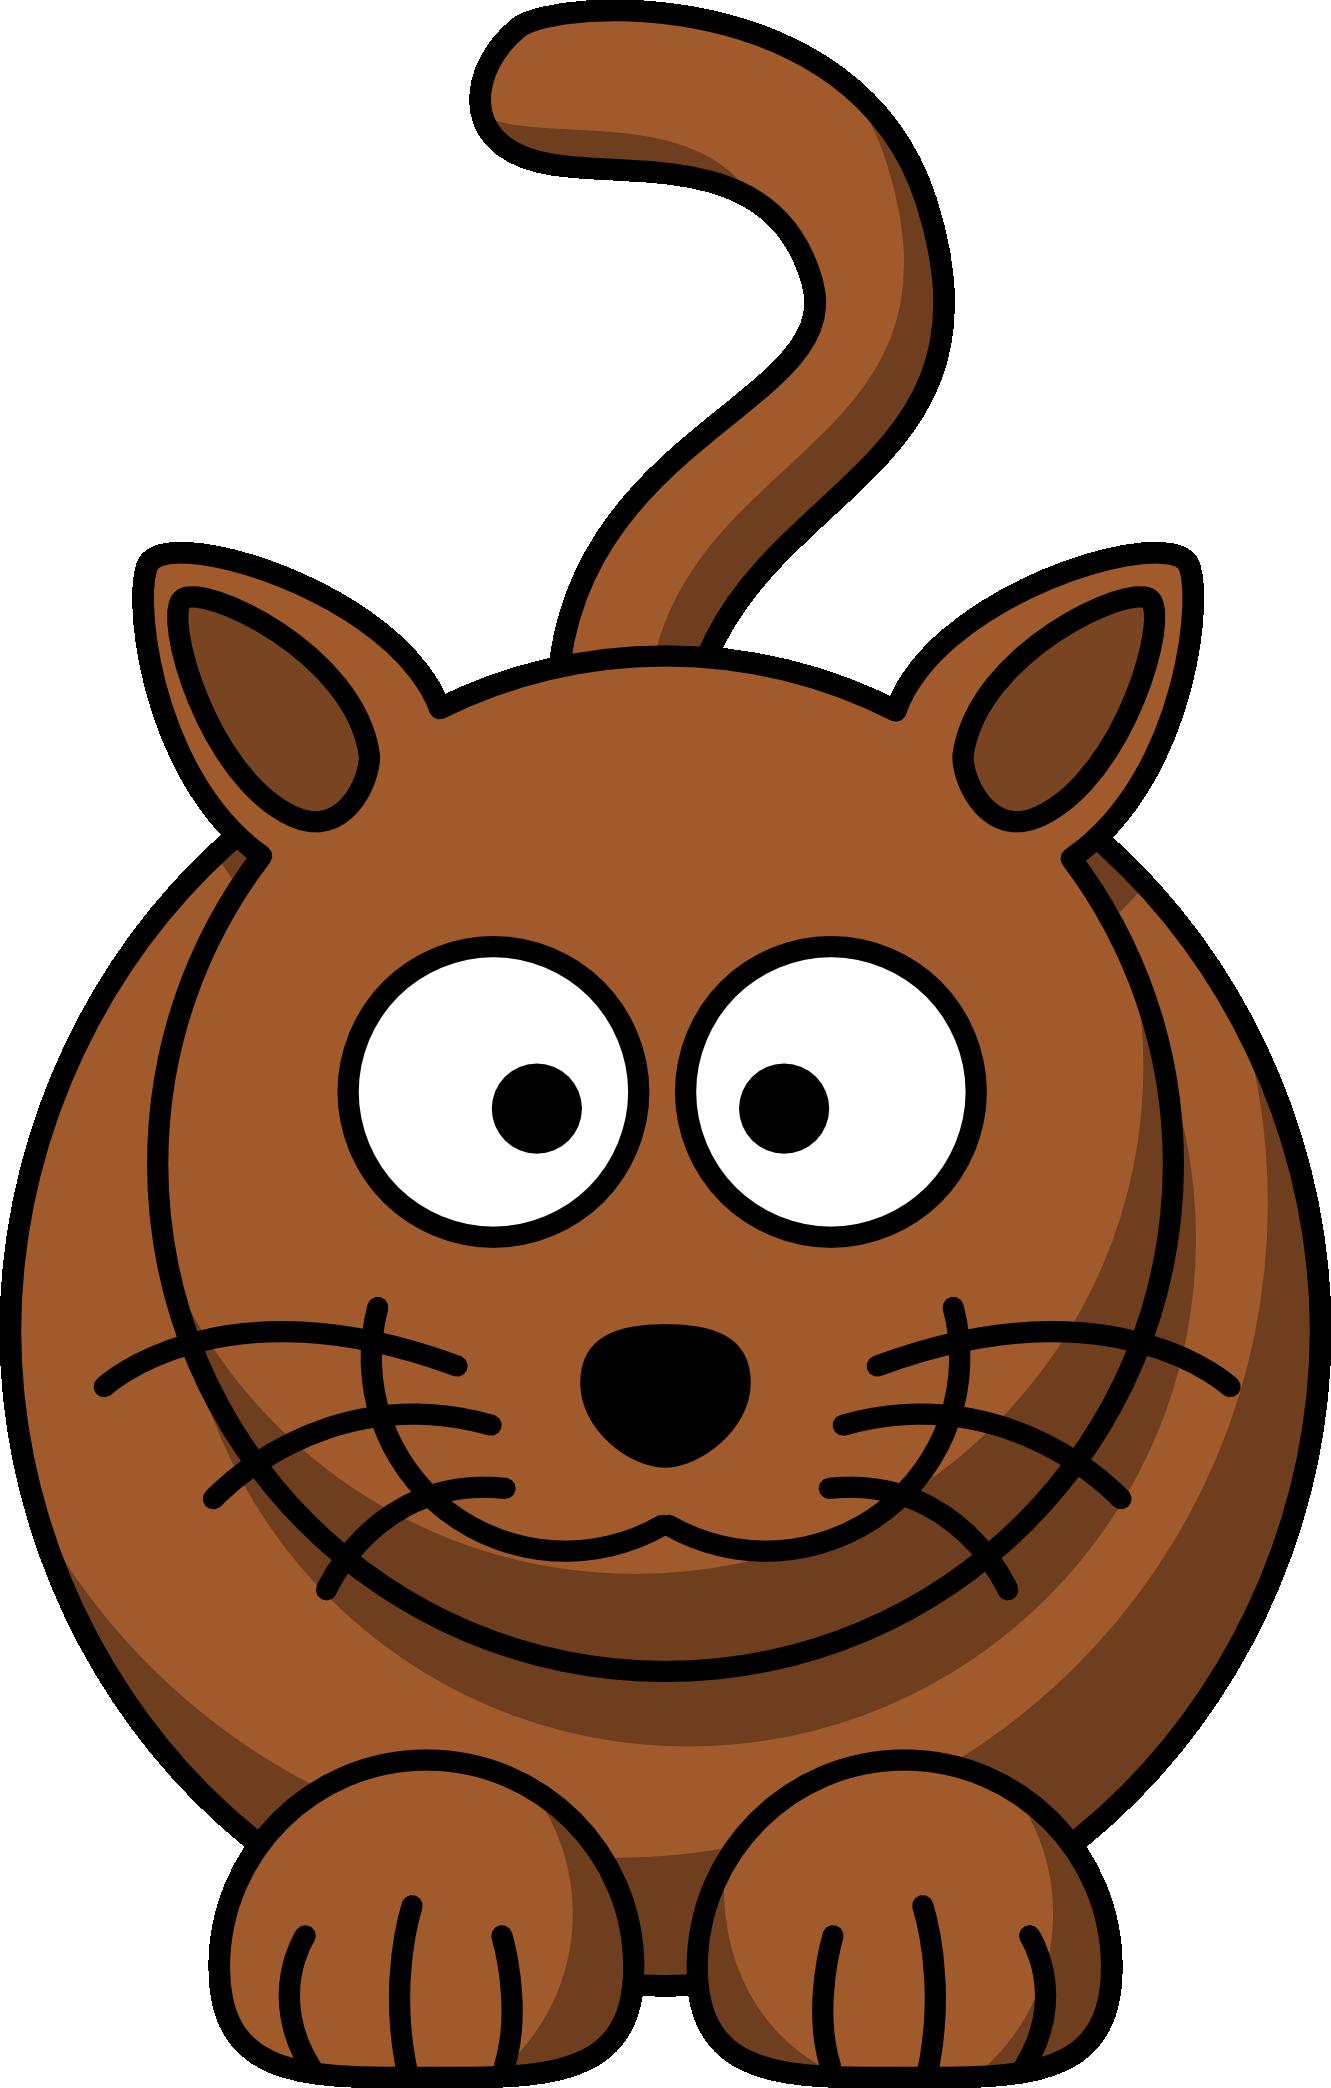 Cartoon Cat Picture - ClipArt Best